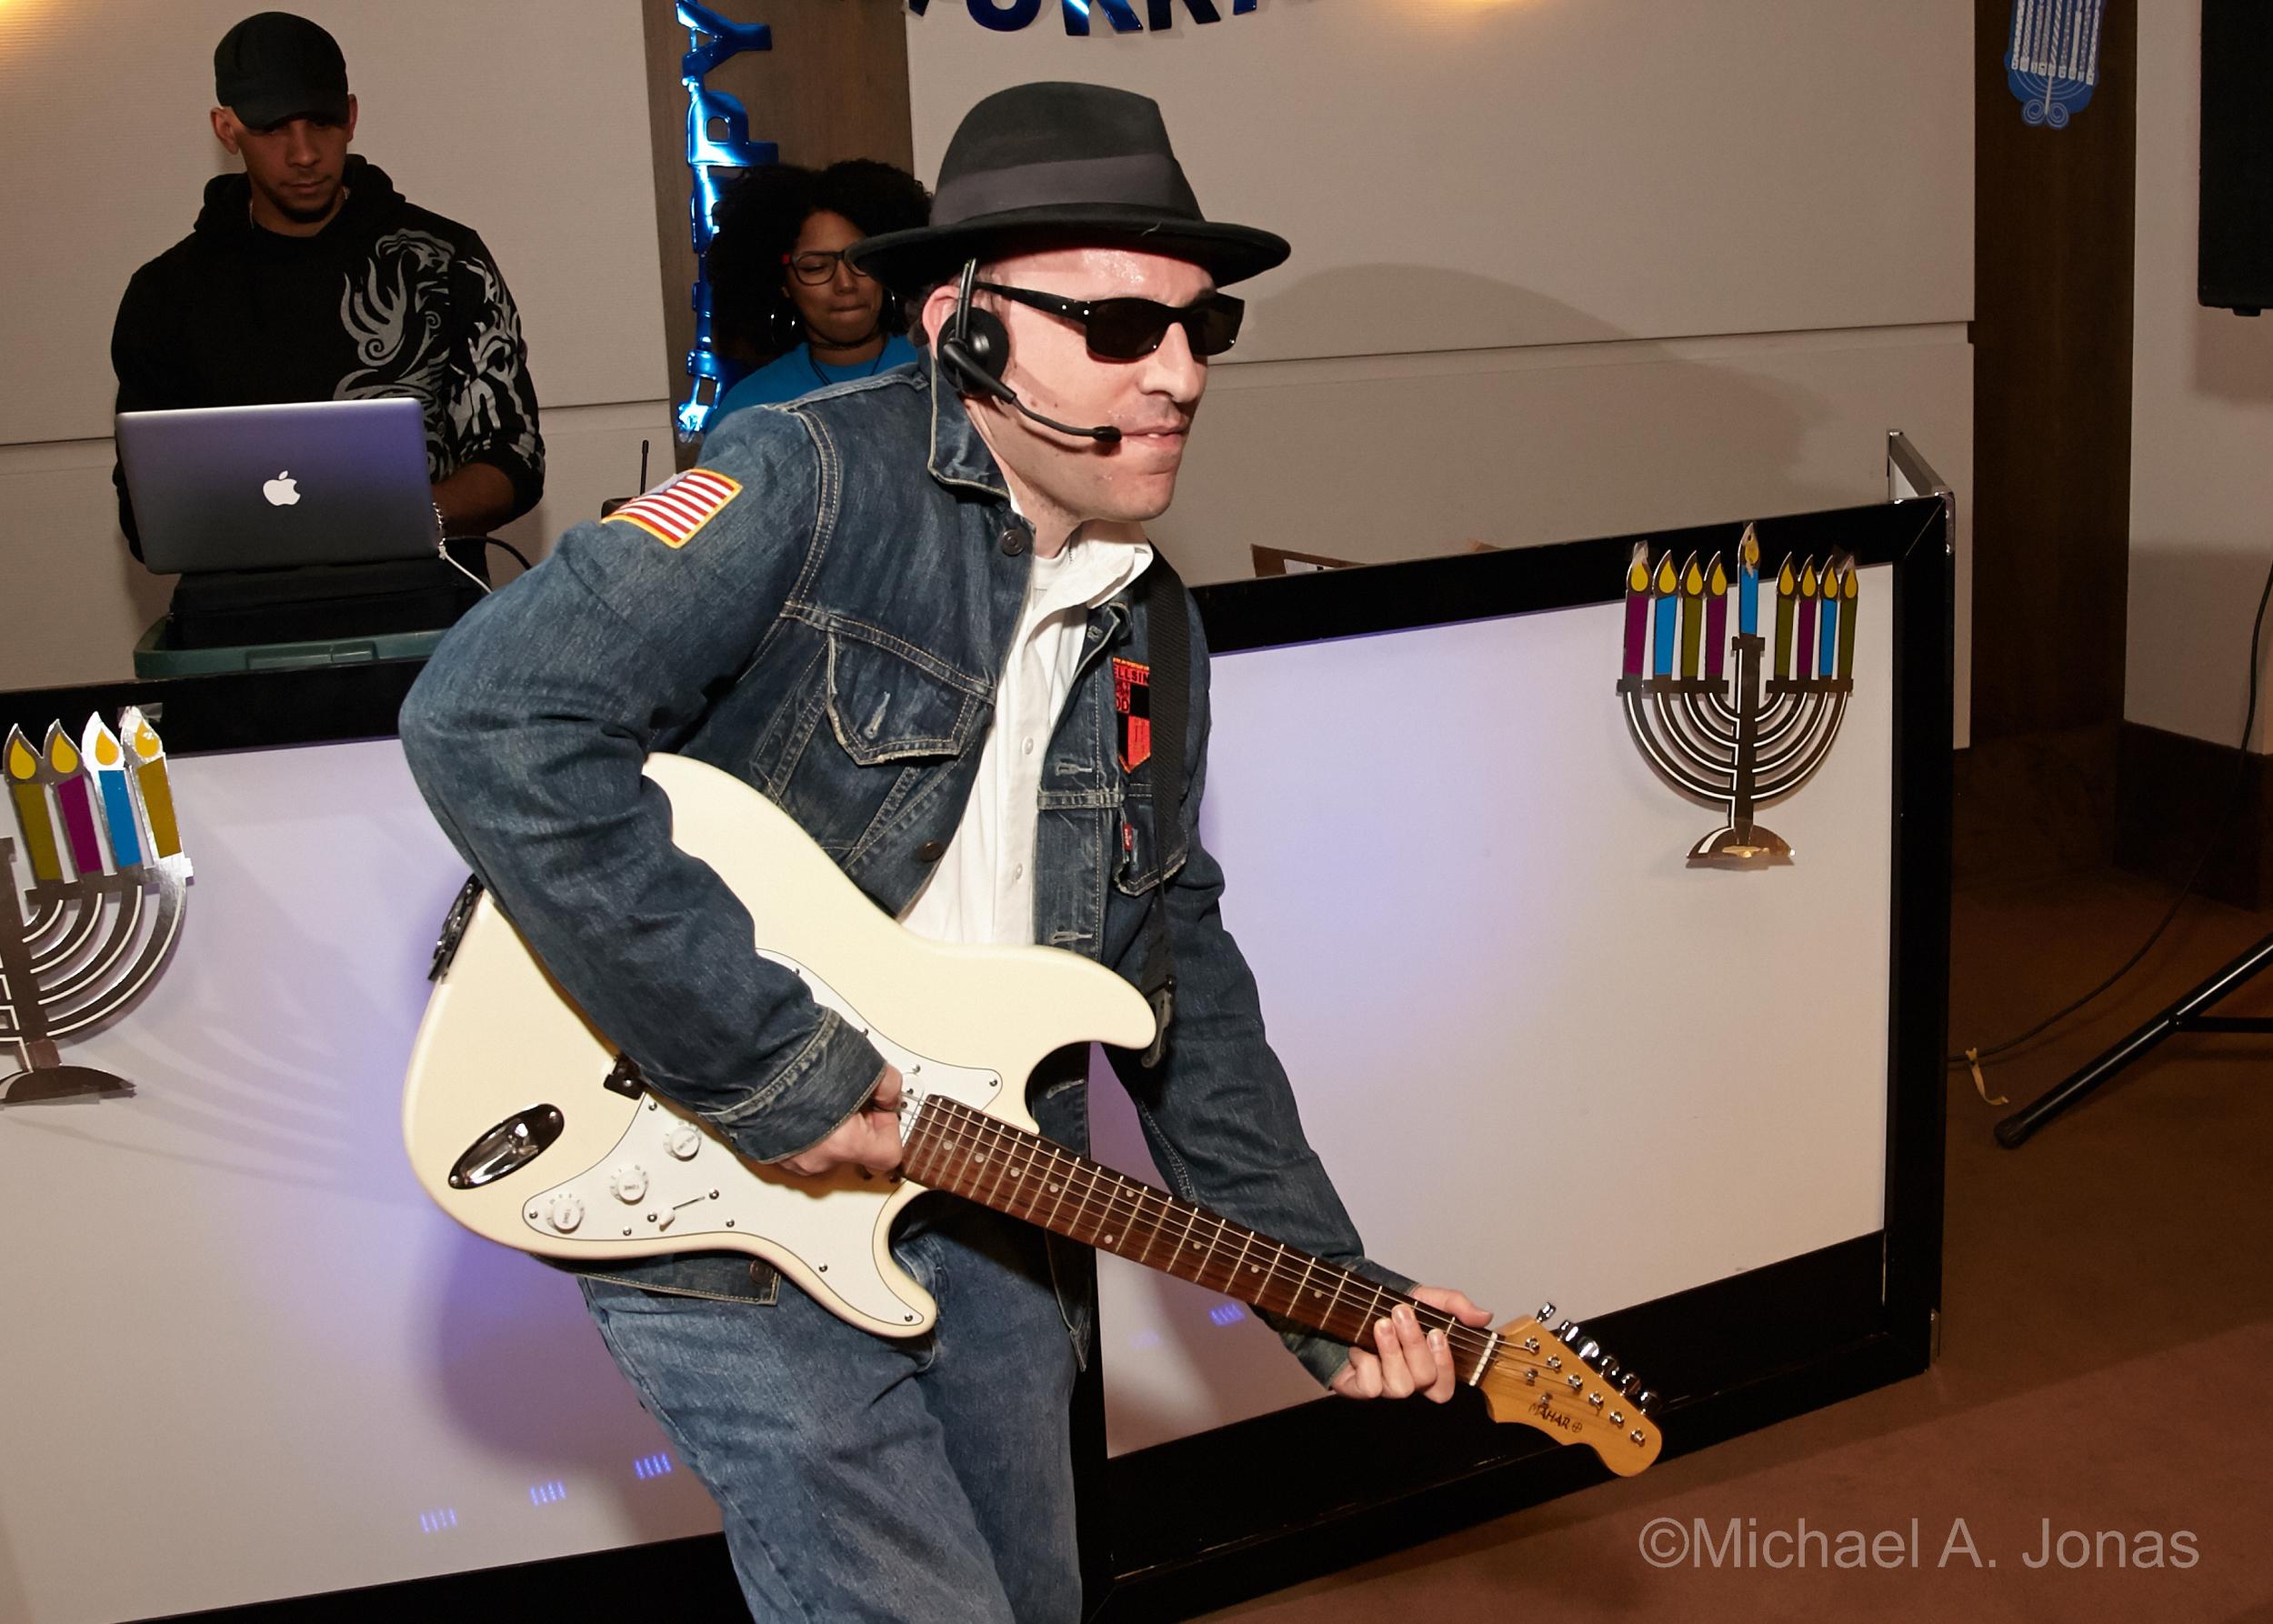 Adam rocking out at JARC's annual ILS Hanukkah Party